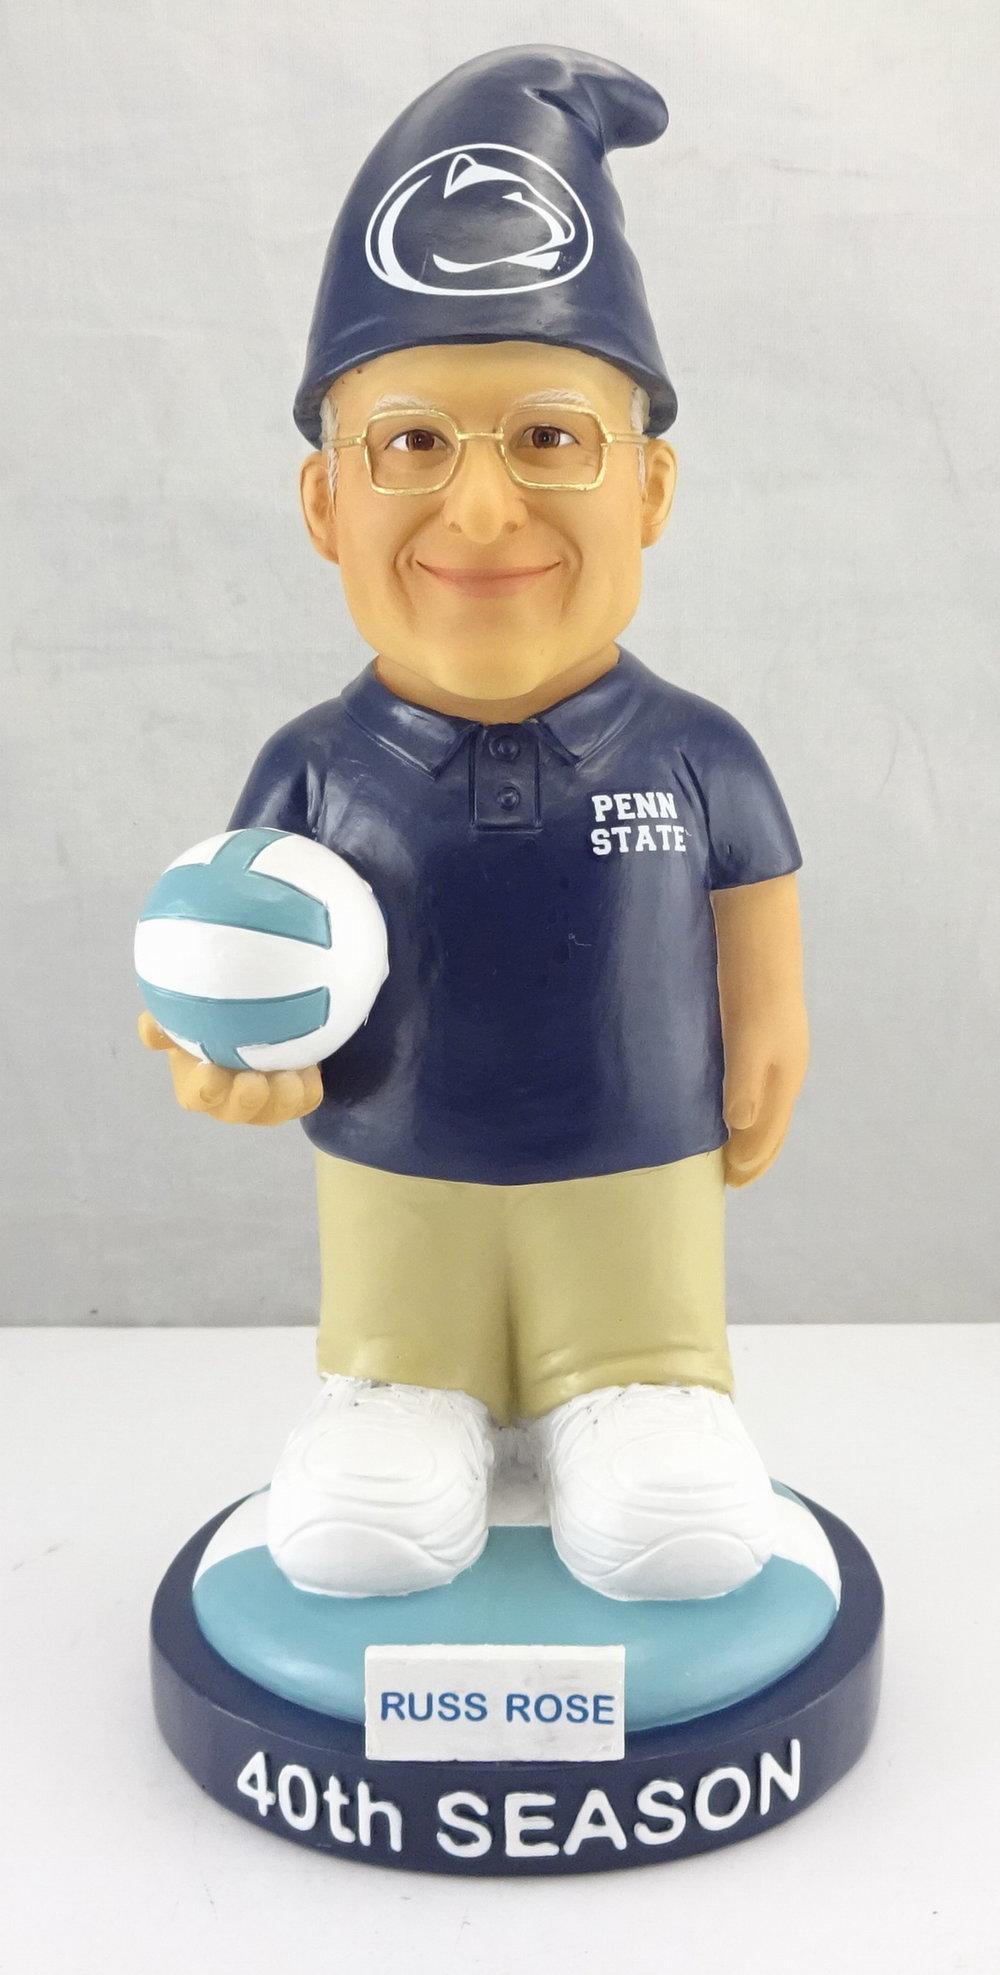 Penn State University - Coach Russ Rose 113638, 7in Gnome (1).jpg